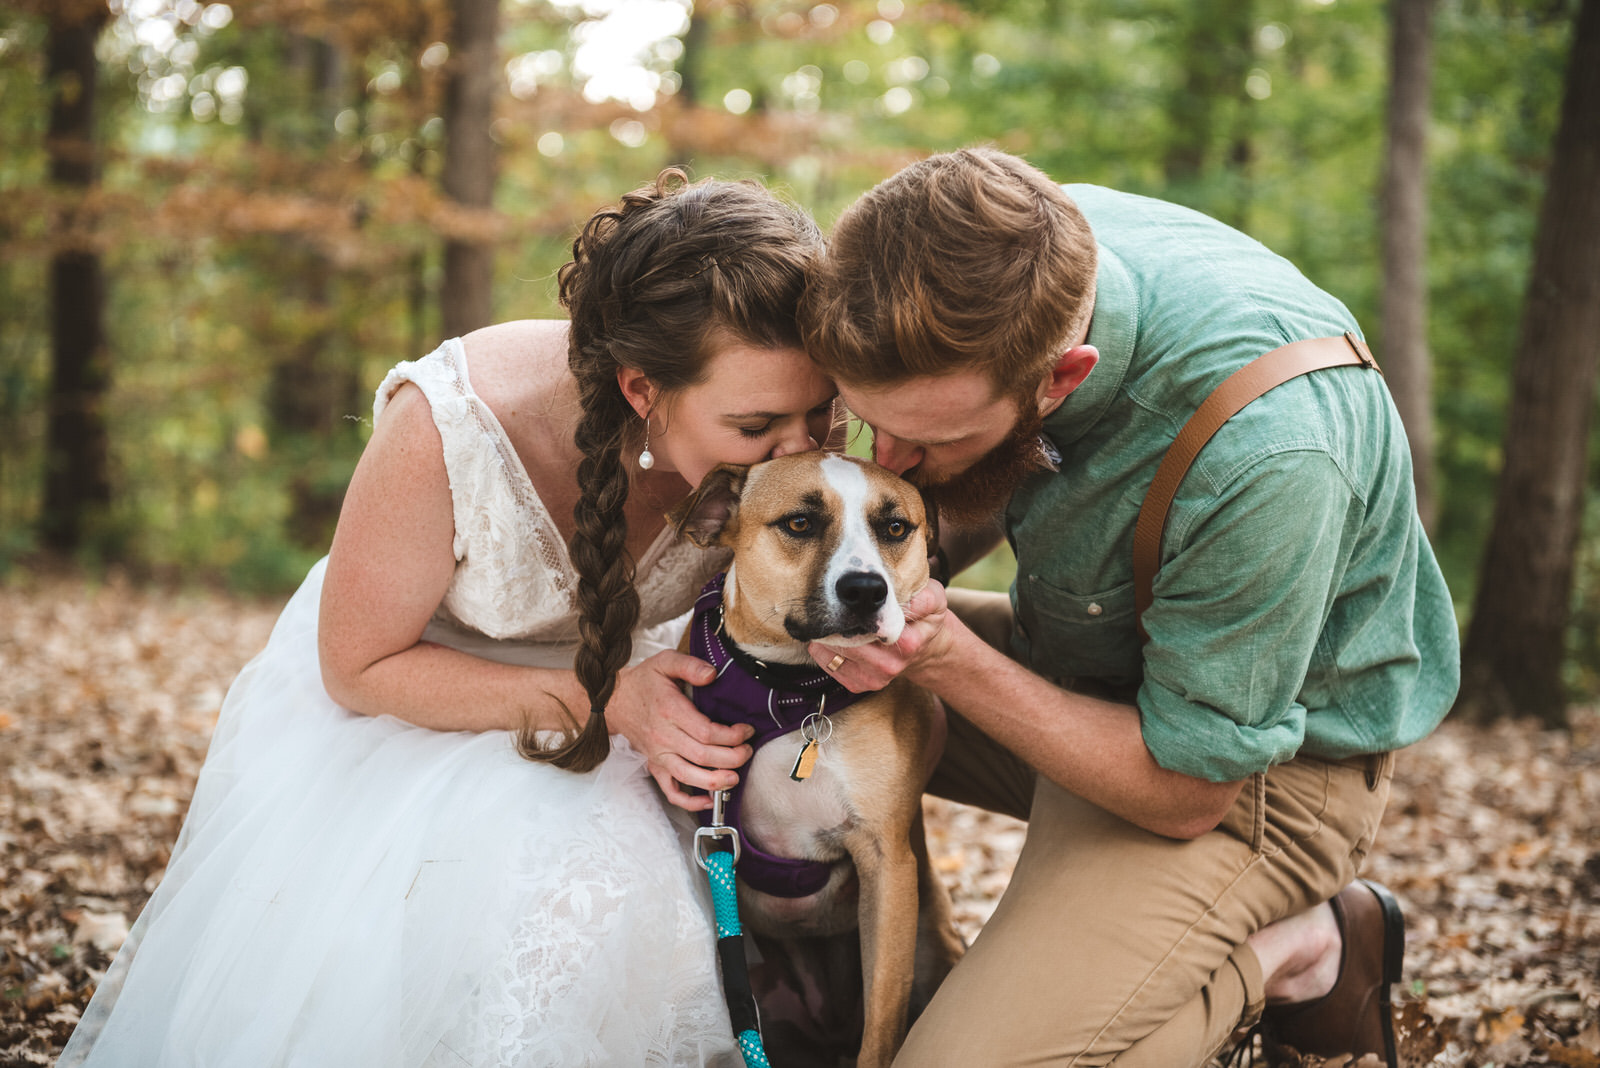 wedding-dog-groom